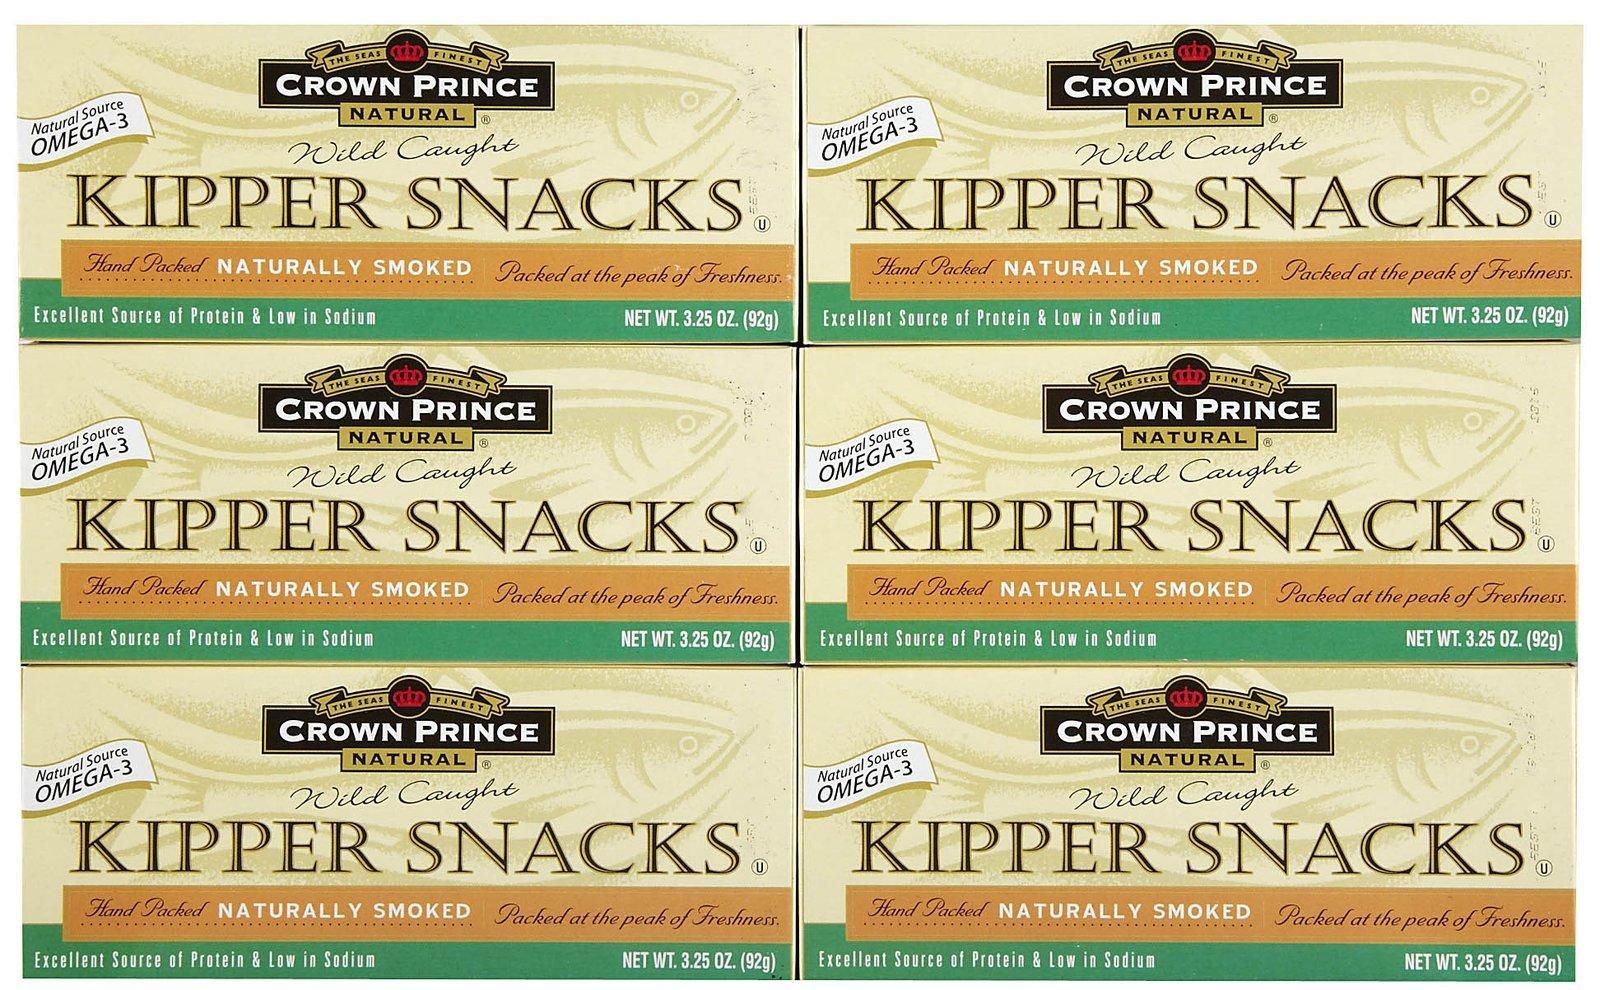 Crown Prince Natural Kipper Snacks Low in Sodium, 3.25 oz, 6 pk